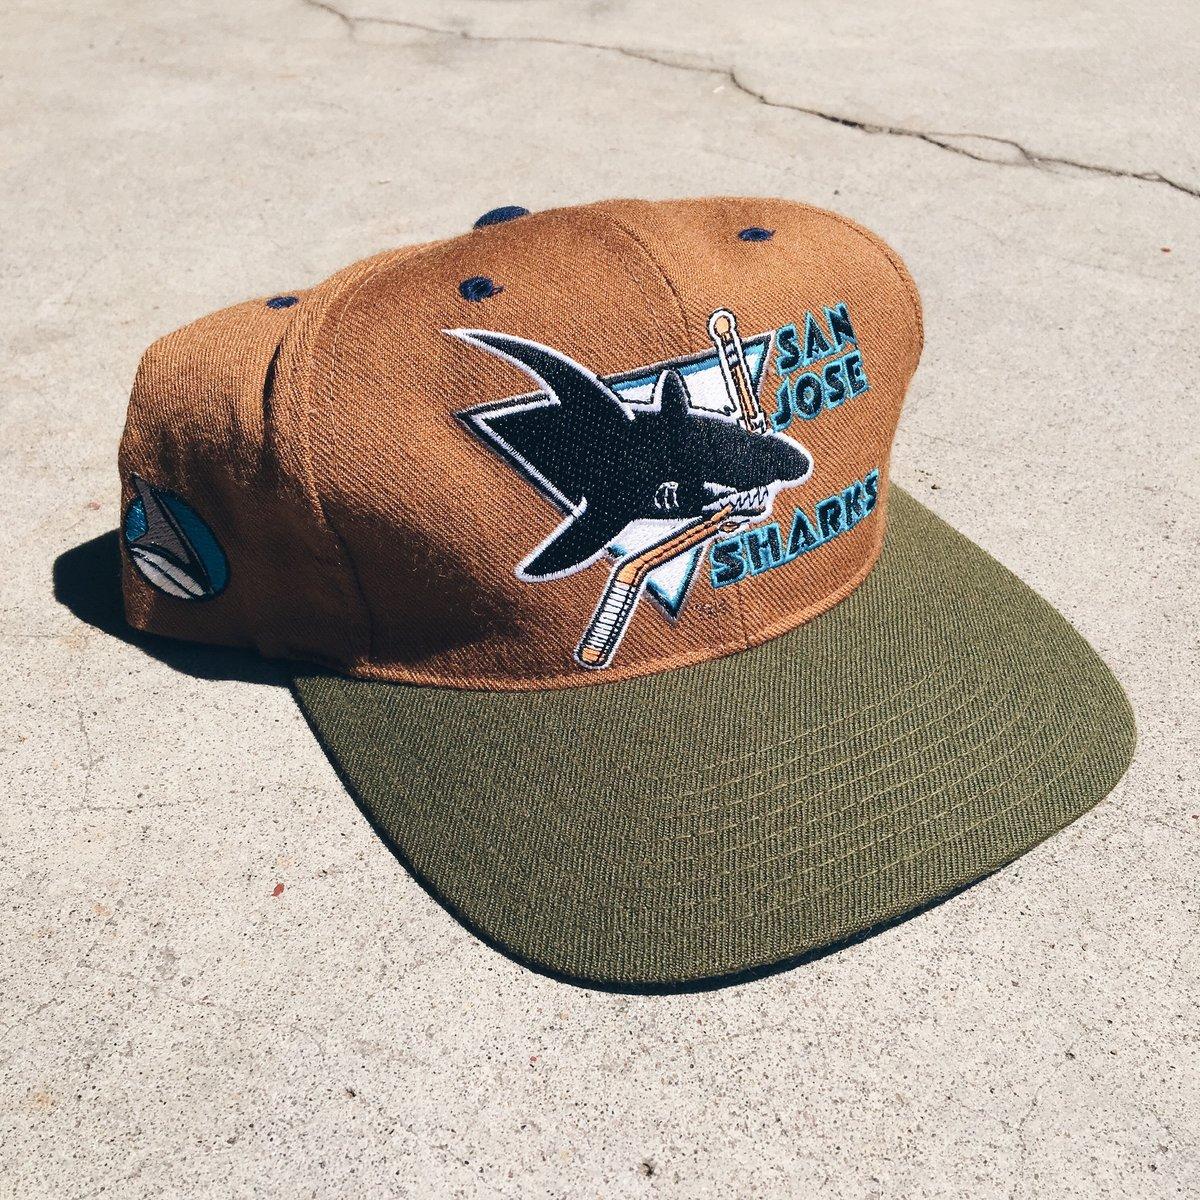 Image of Original 90's American Needle San Jose Sharks Snapback Hat.